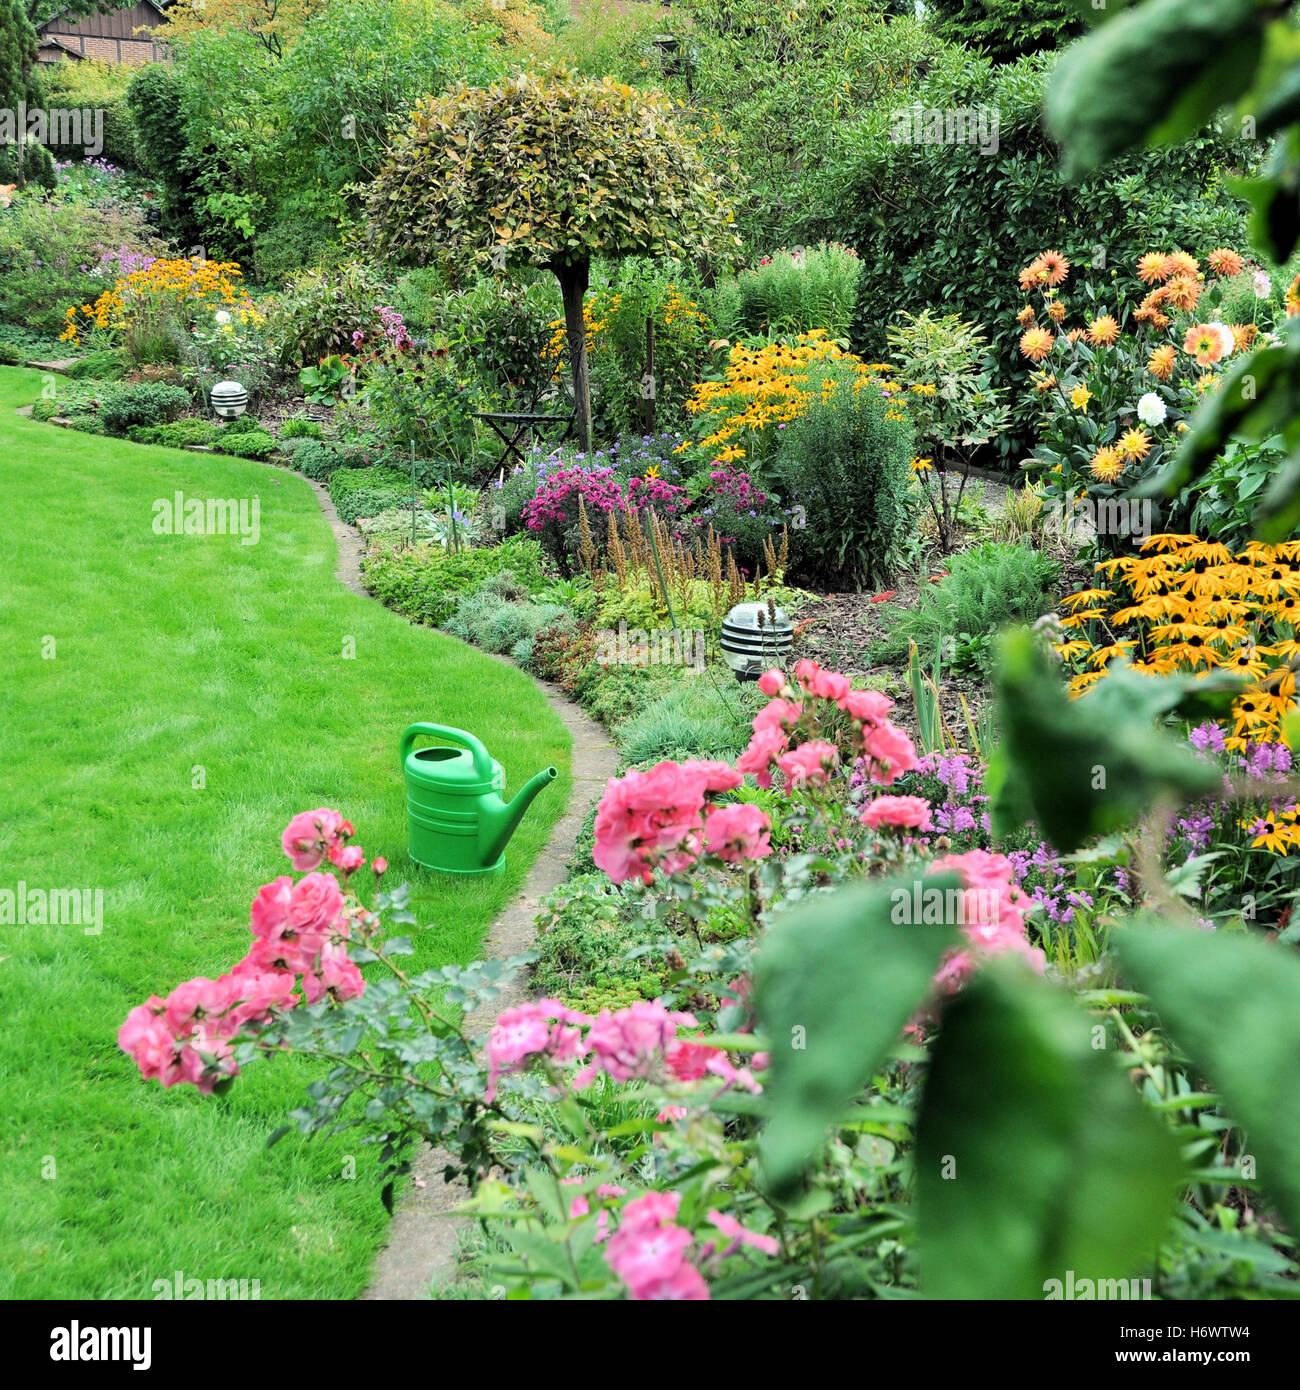 Fleur fleurs jardin jardins de plantes jardin fleurs arrosoir jardin ...